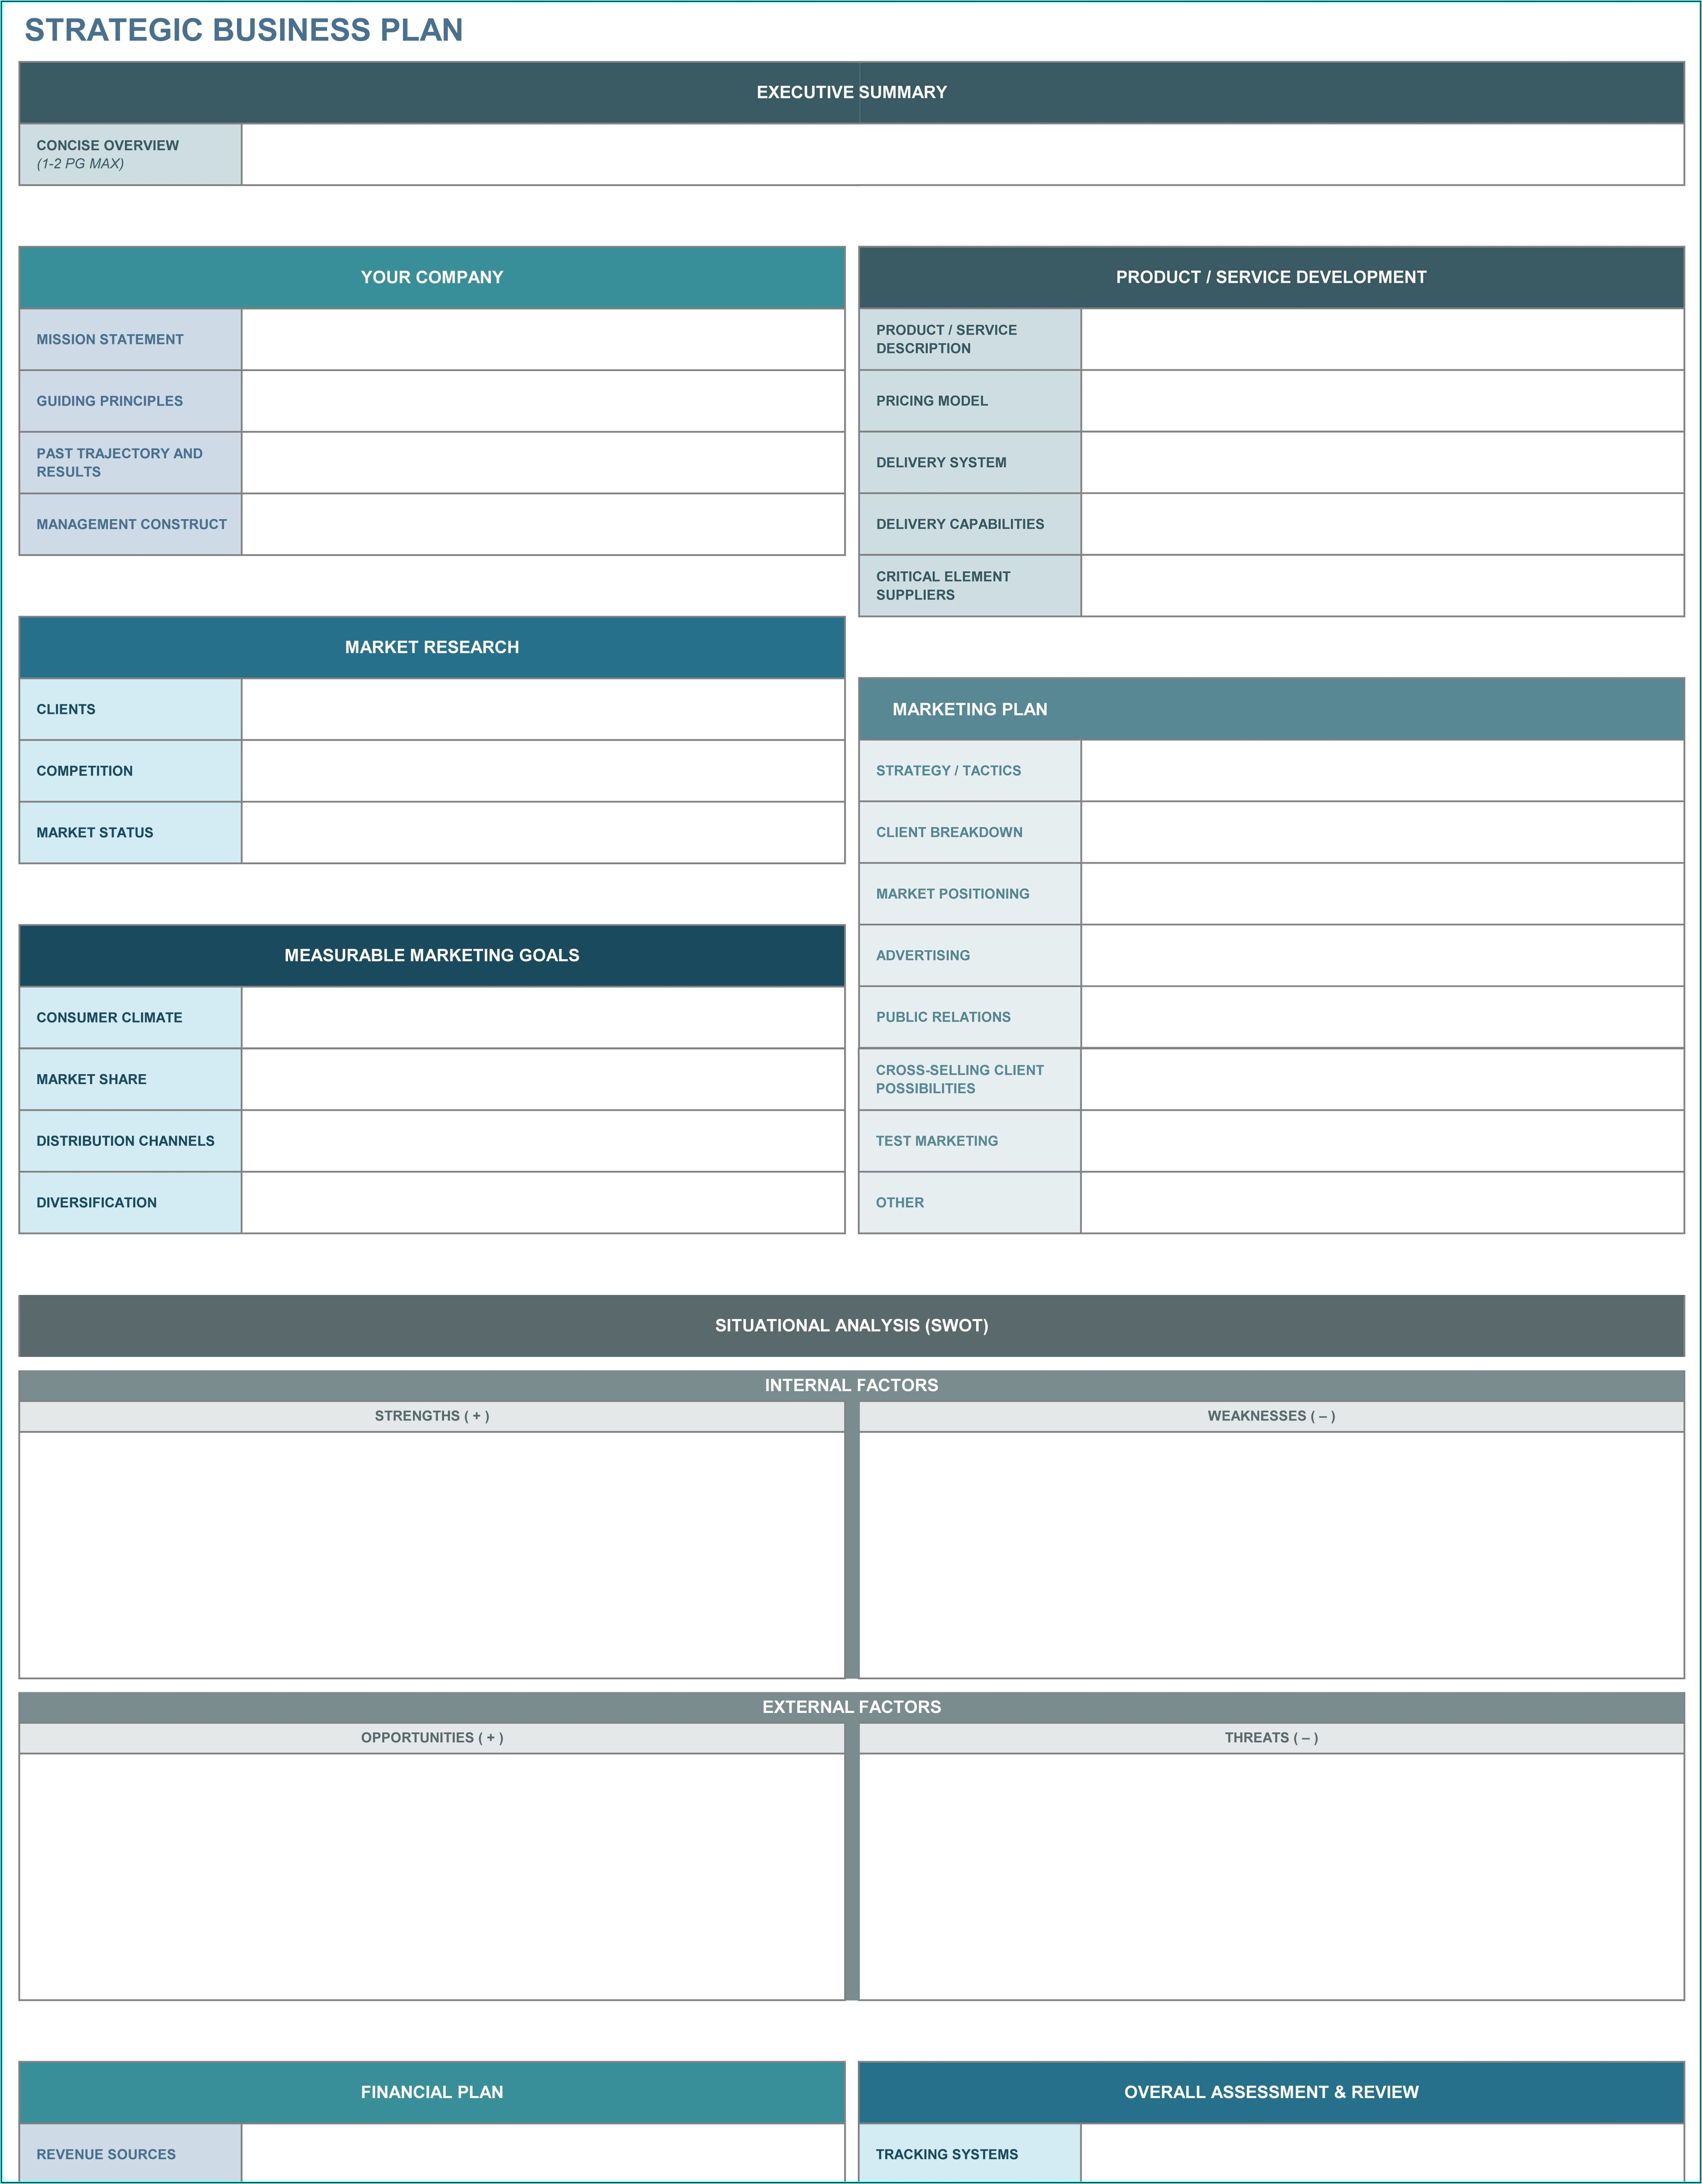 Strategic Plan Template Excel Free